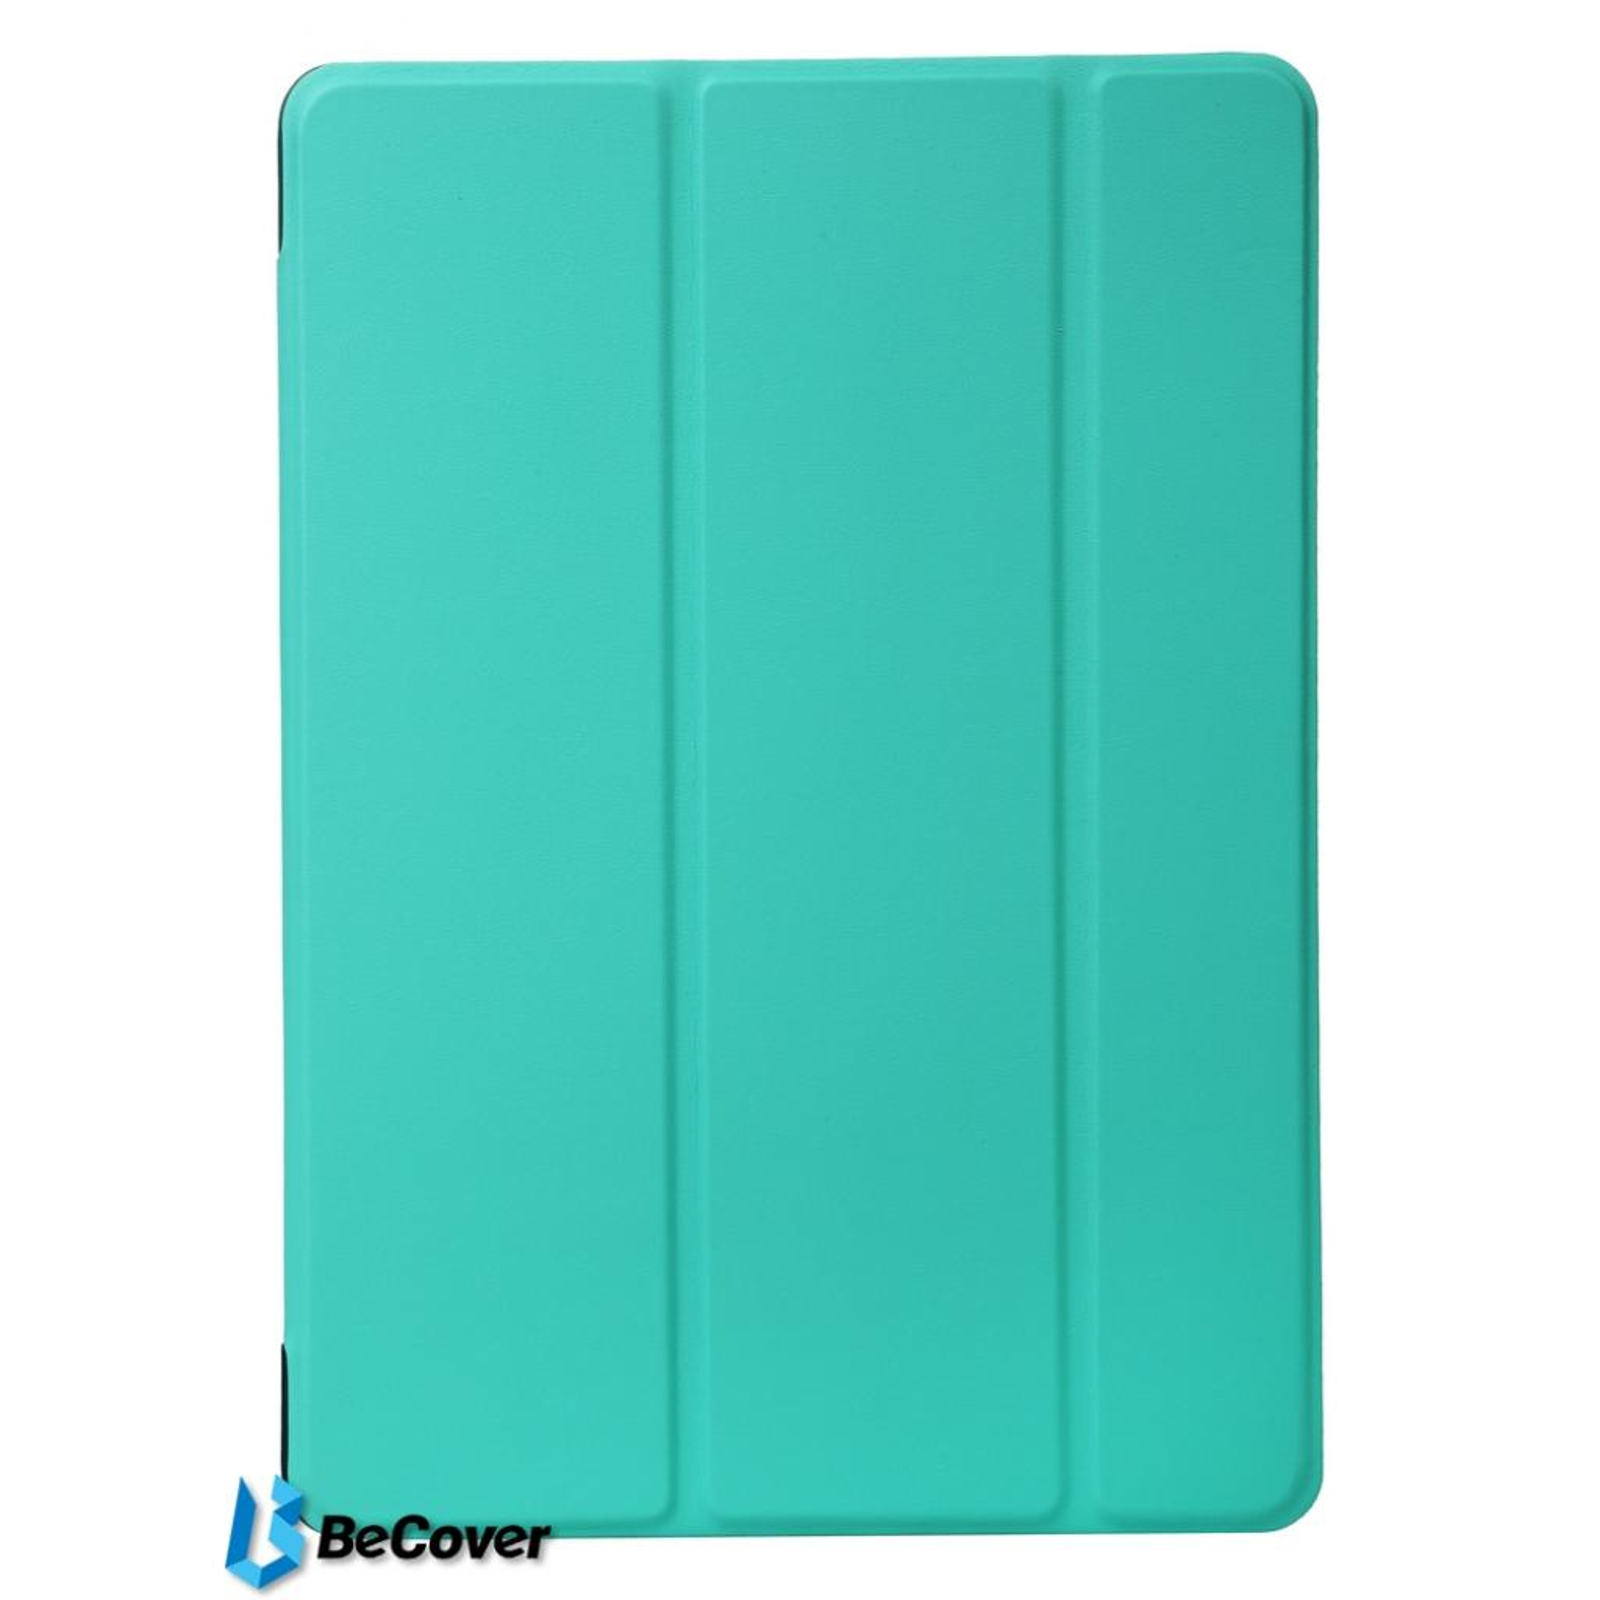 Чехол для планшета BeCover для Apple iPad 10.2 2019/2020 Green (704140)